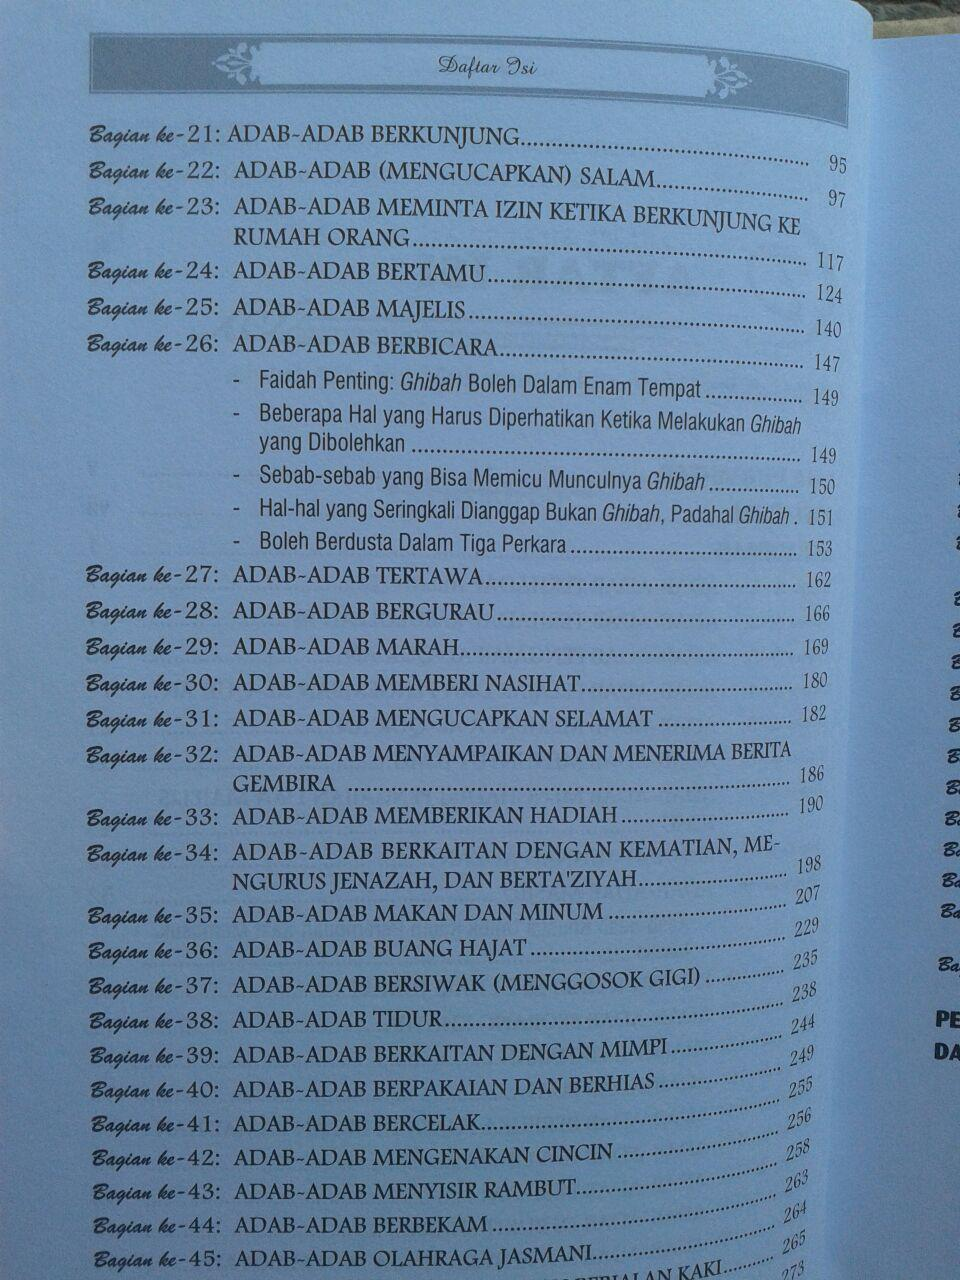 Buku Panduan Lengkap Praktis Adab dan Akhlak Islami isi 3